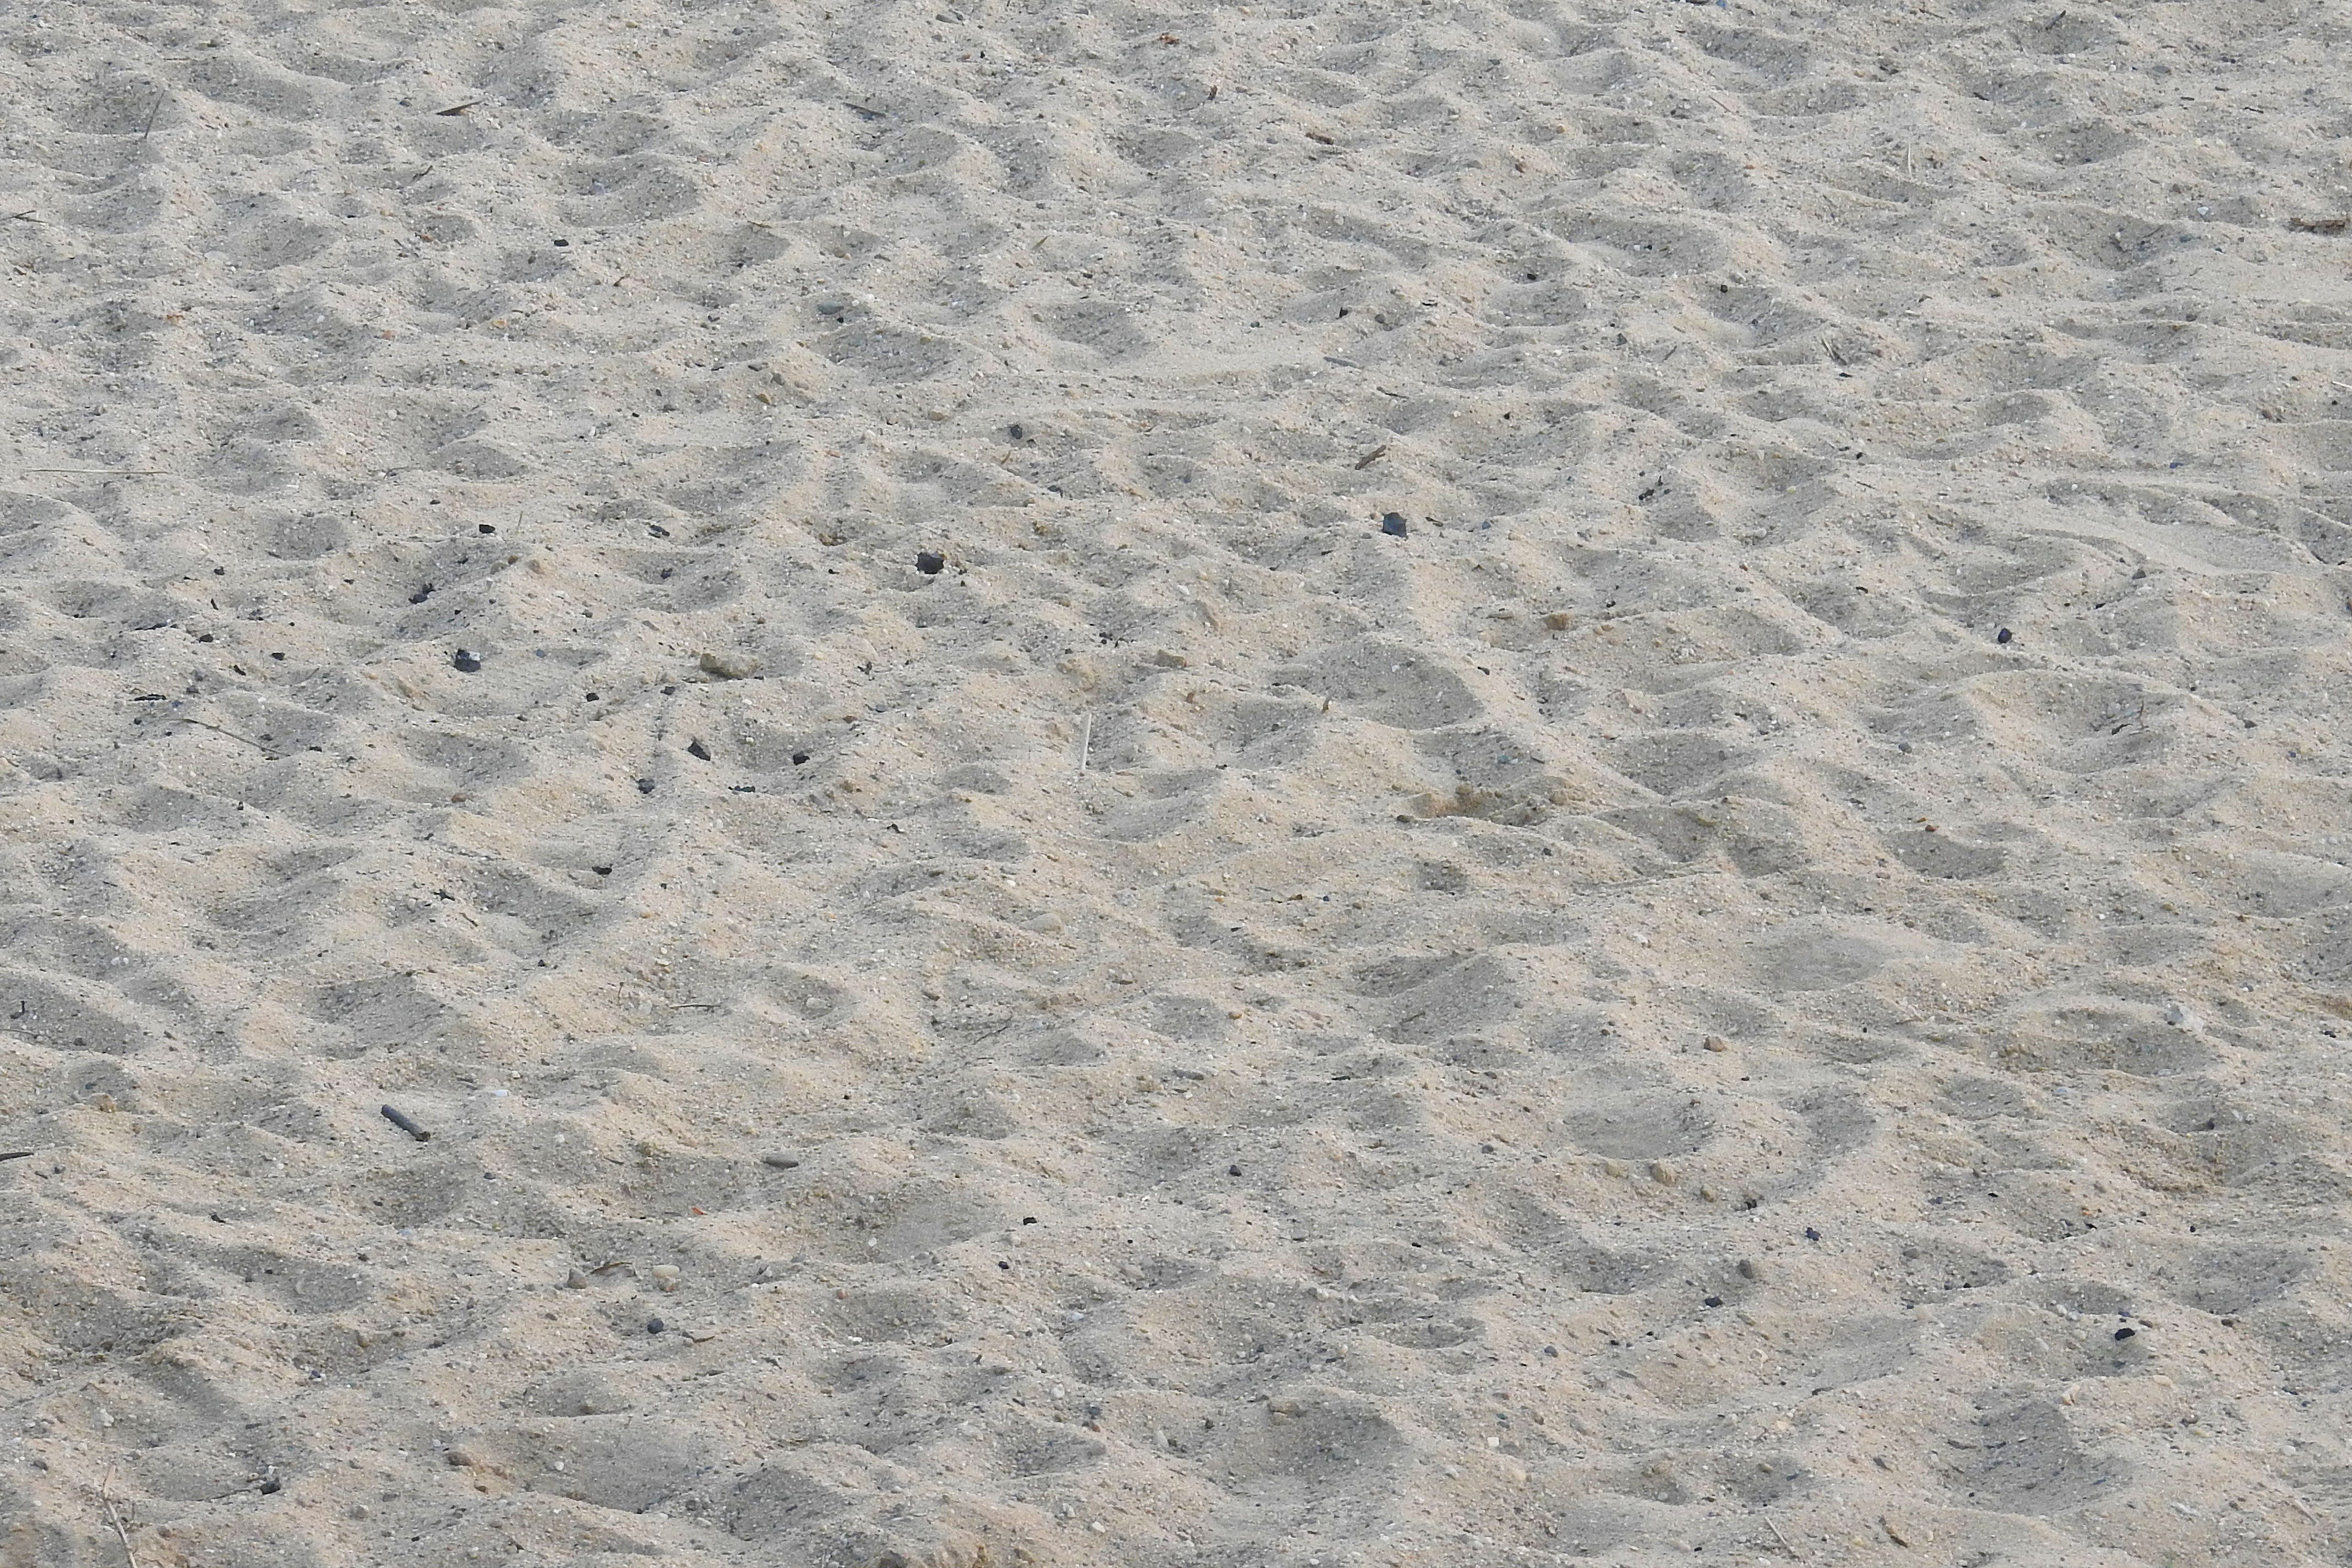 Free stock photo of sand, texture, background, pebble